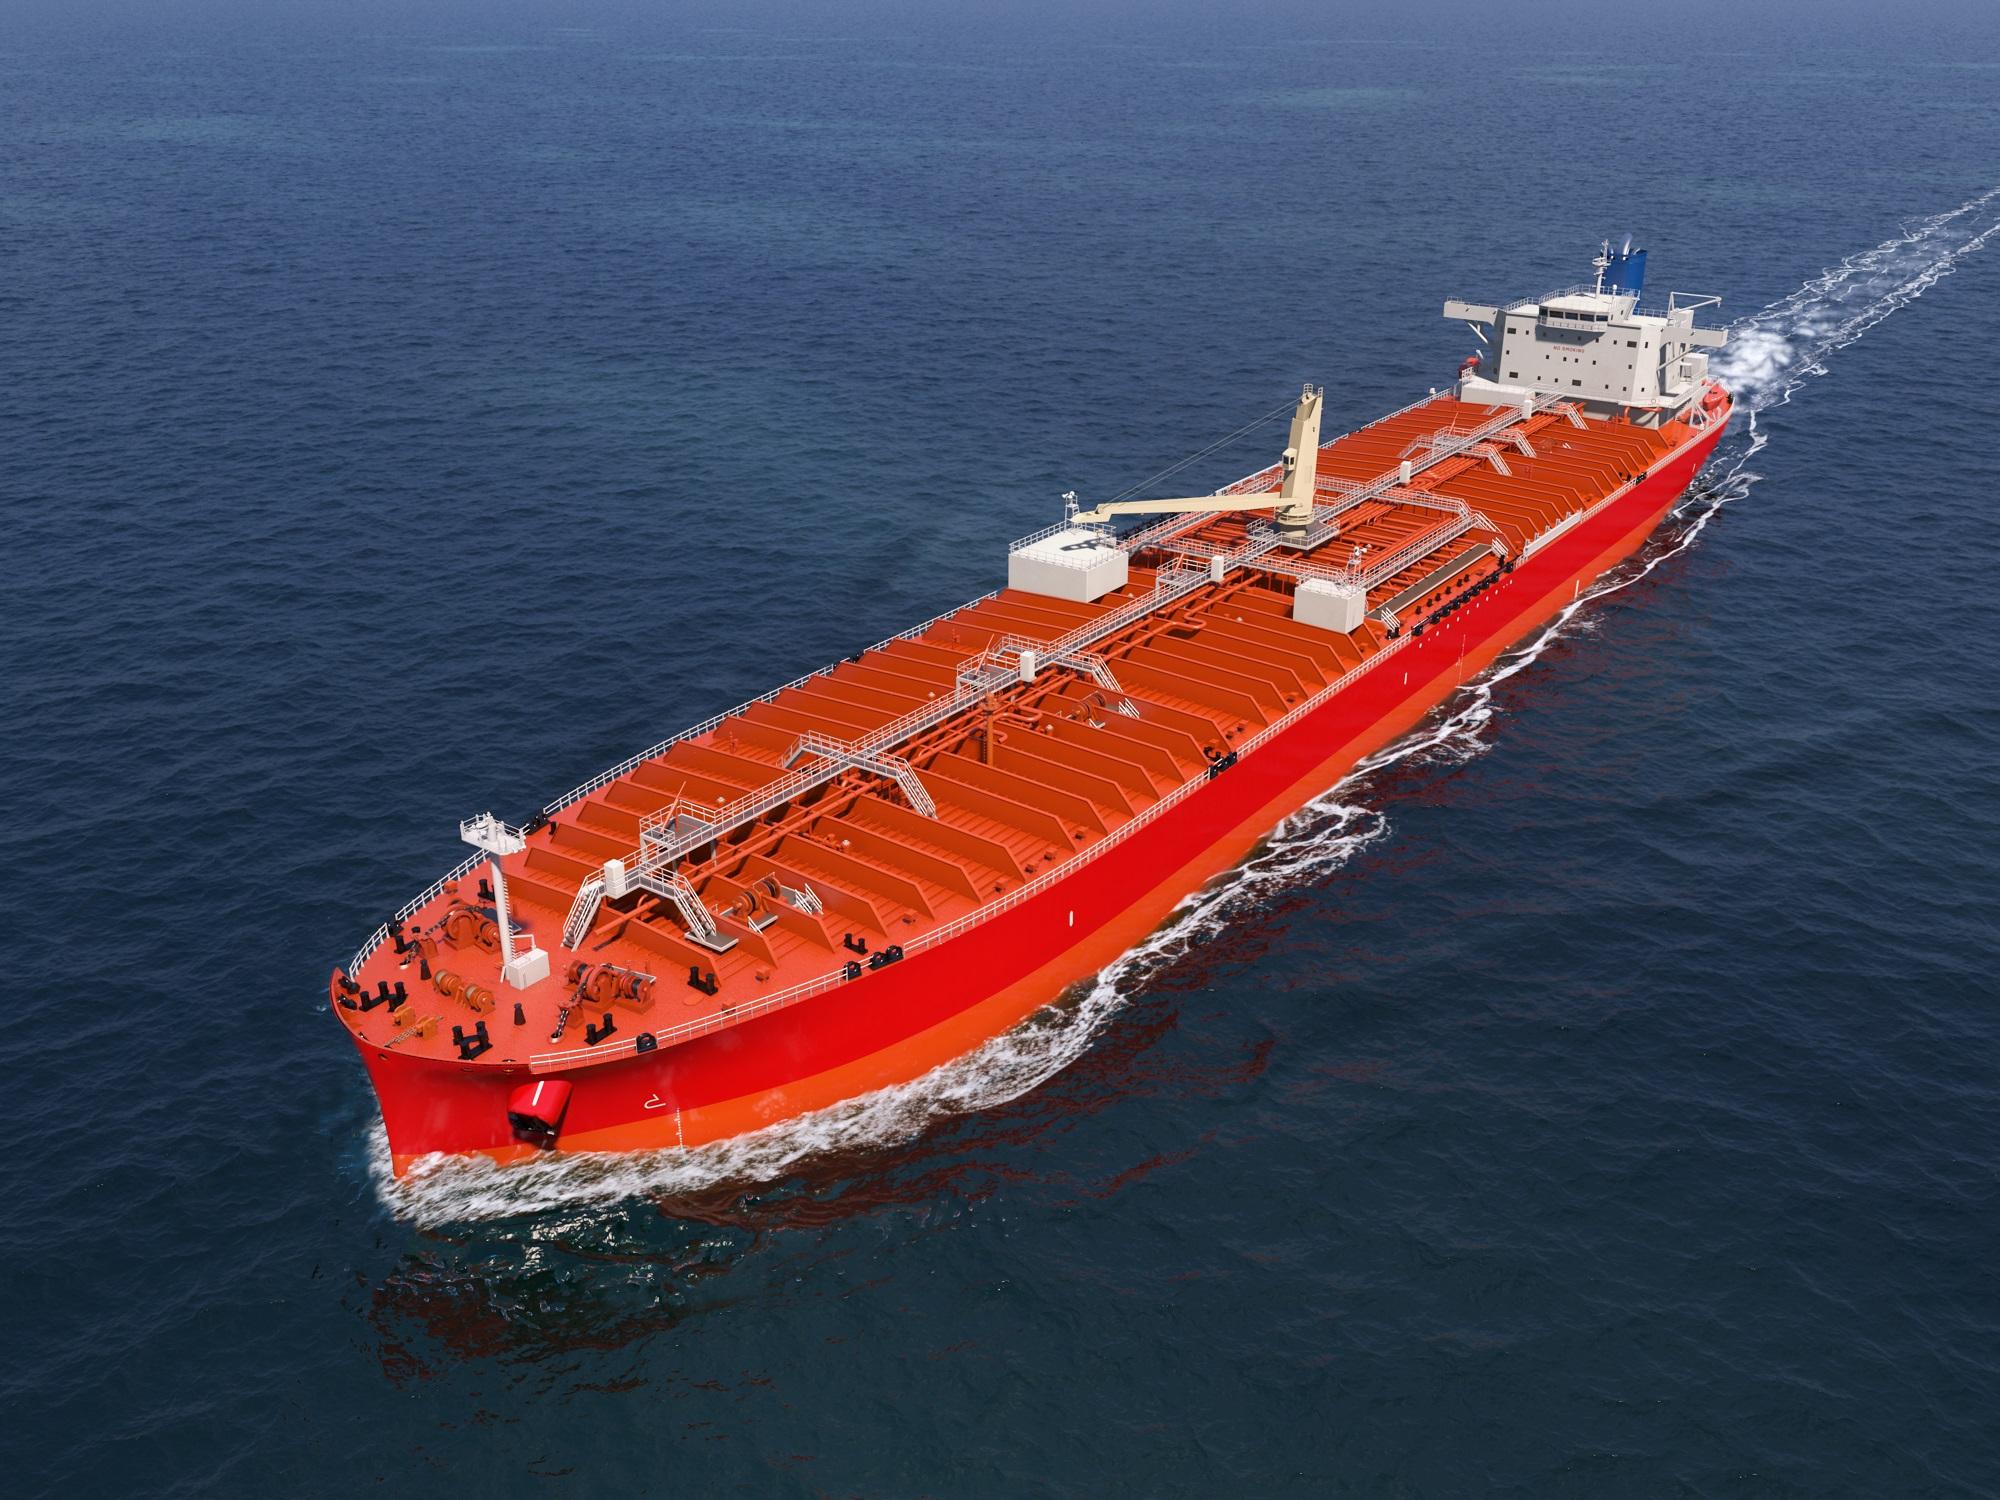 LRI Product/Chemical Tanker